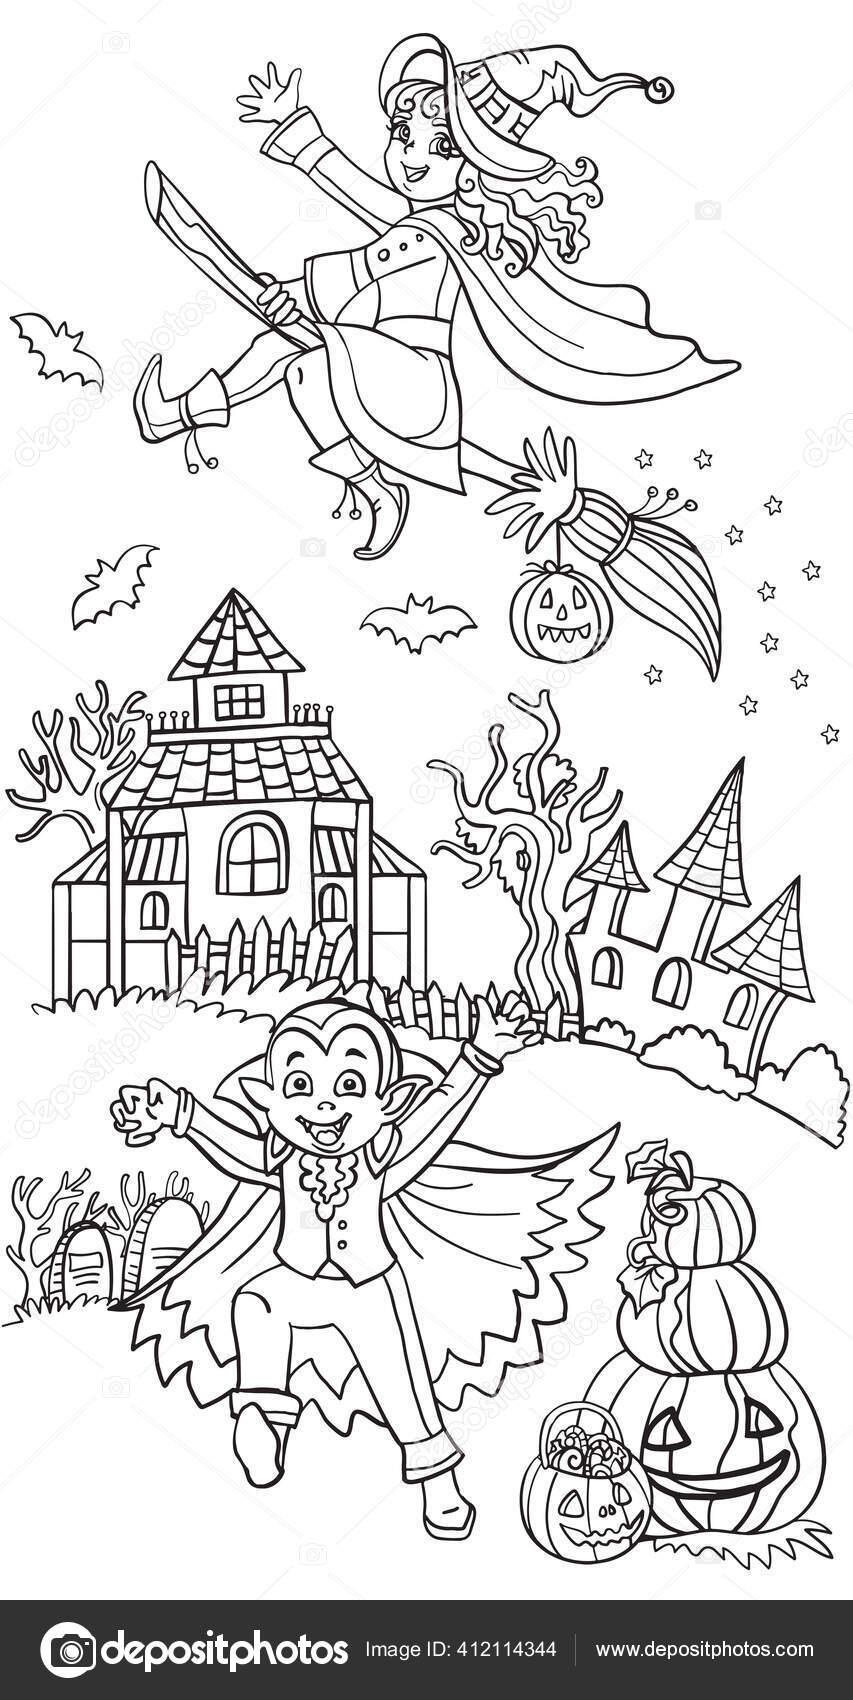 Cartoon Halloween Illustration Vector Coloring Pages Happy Children Costumes Vampire Vector Image By C Alinart Vector Stock 412114344